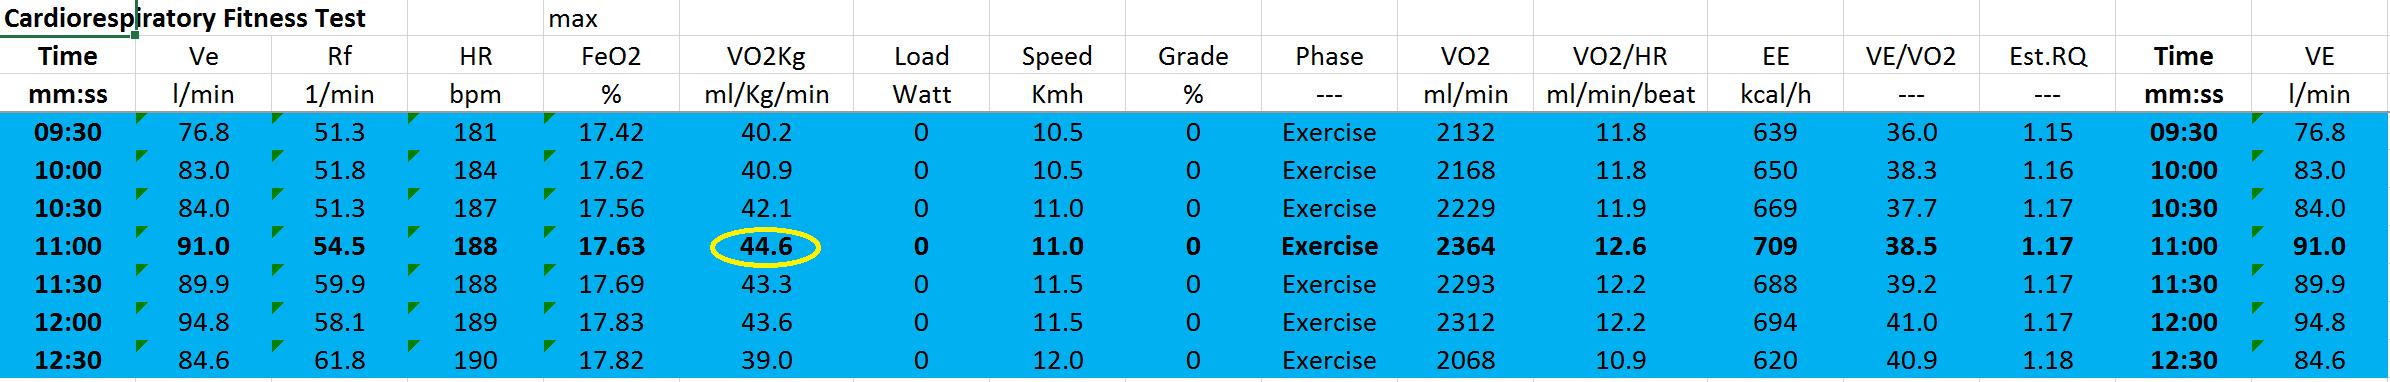 VO2 max before training: 44.6ml/kg/min